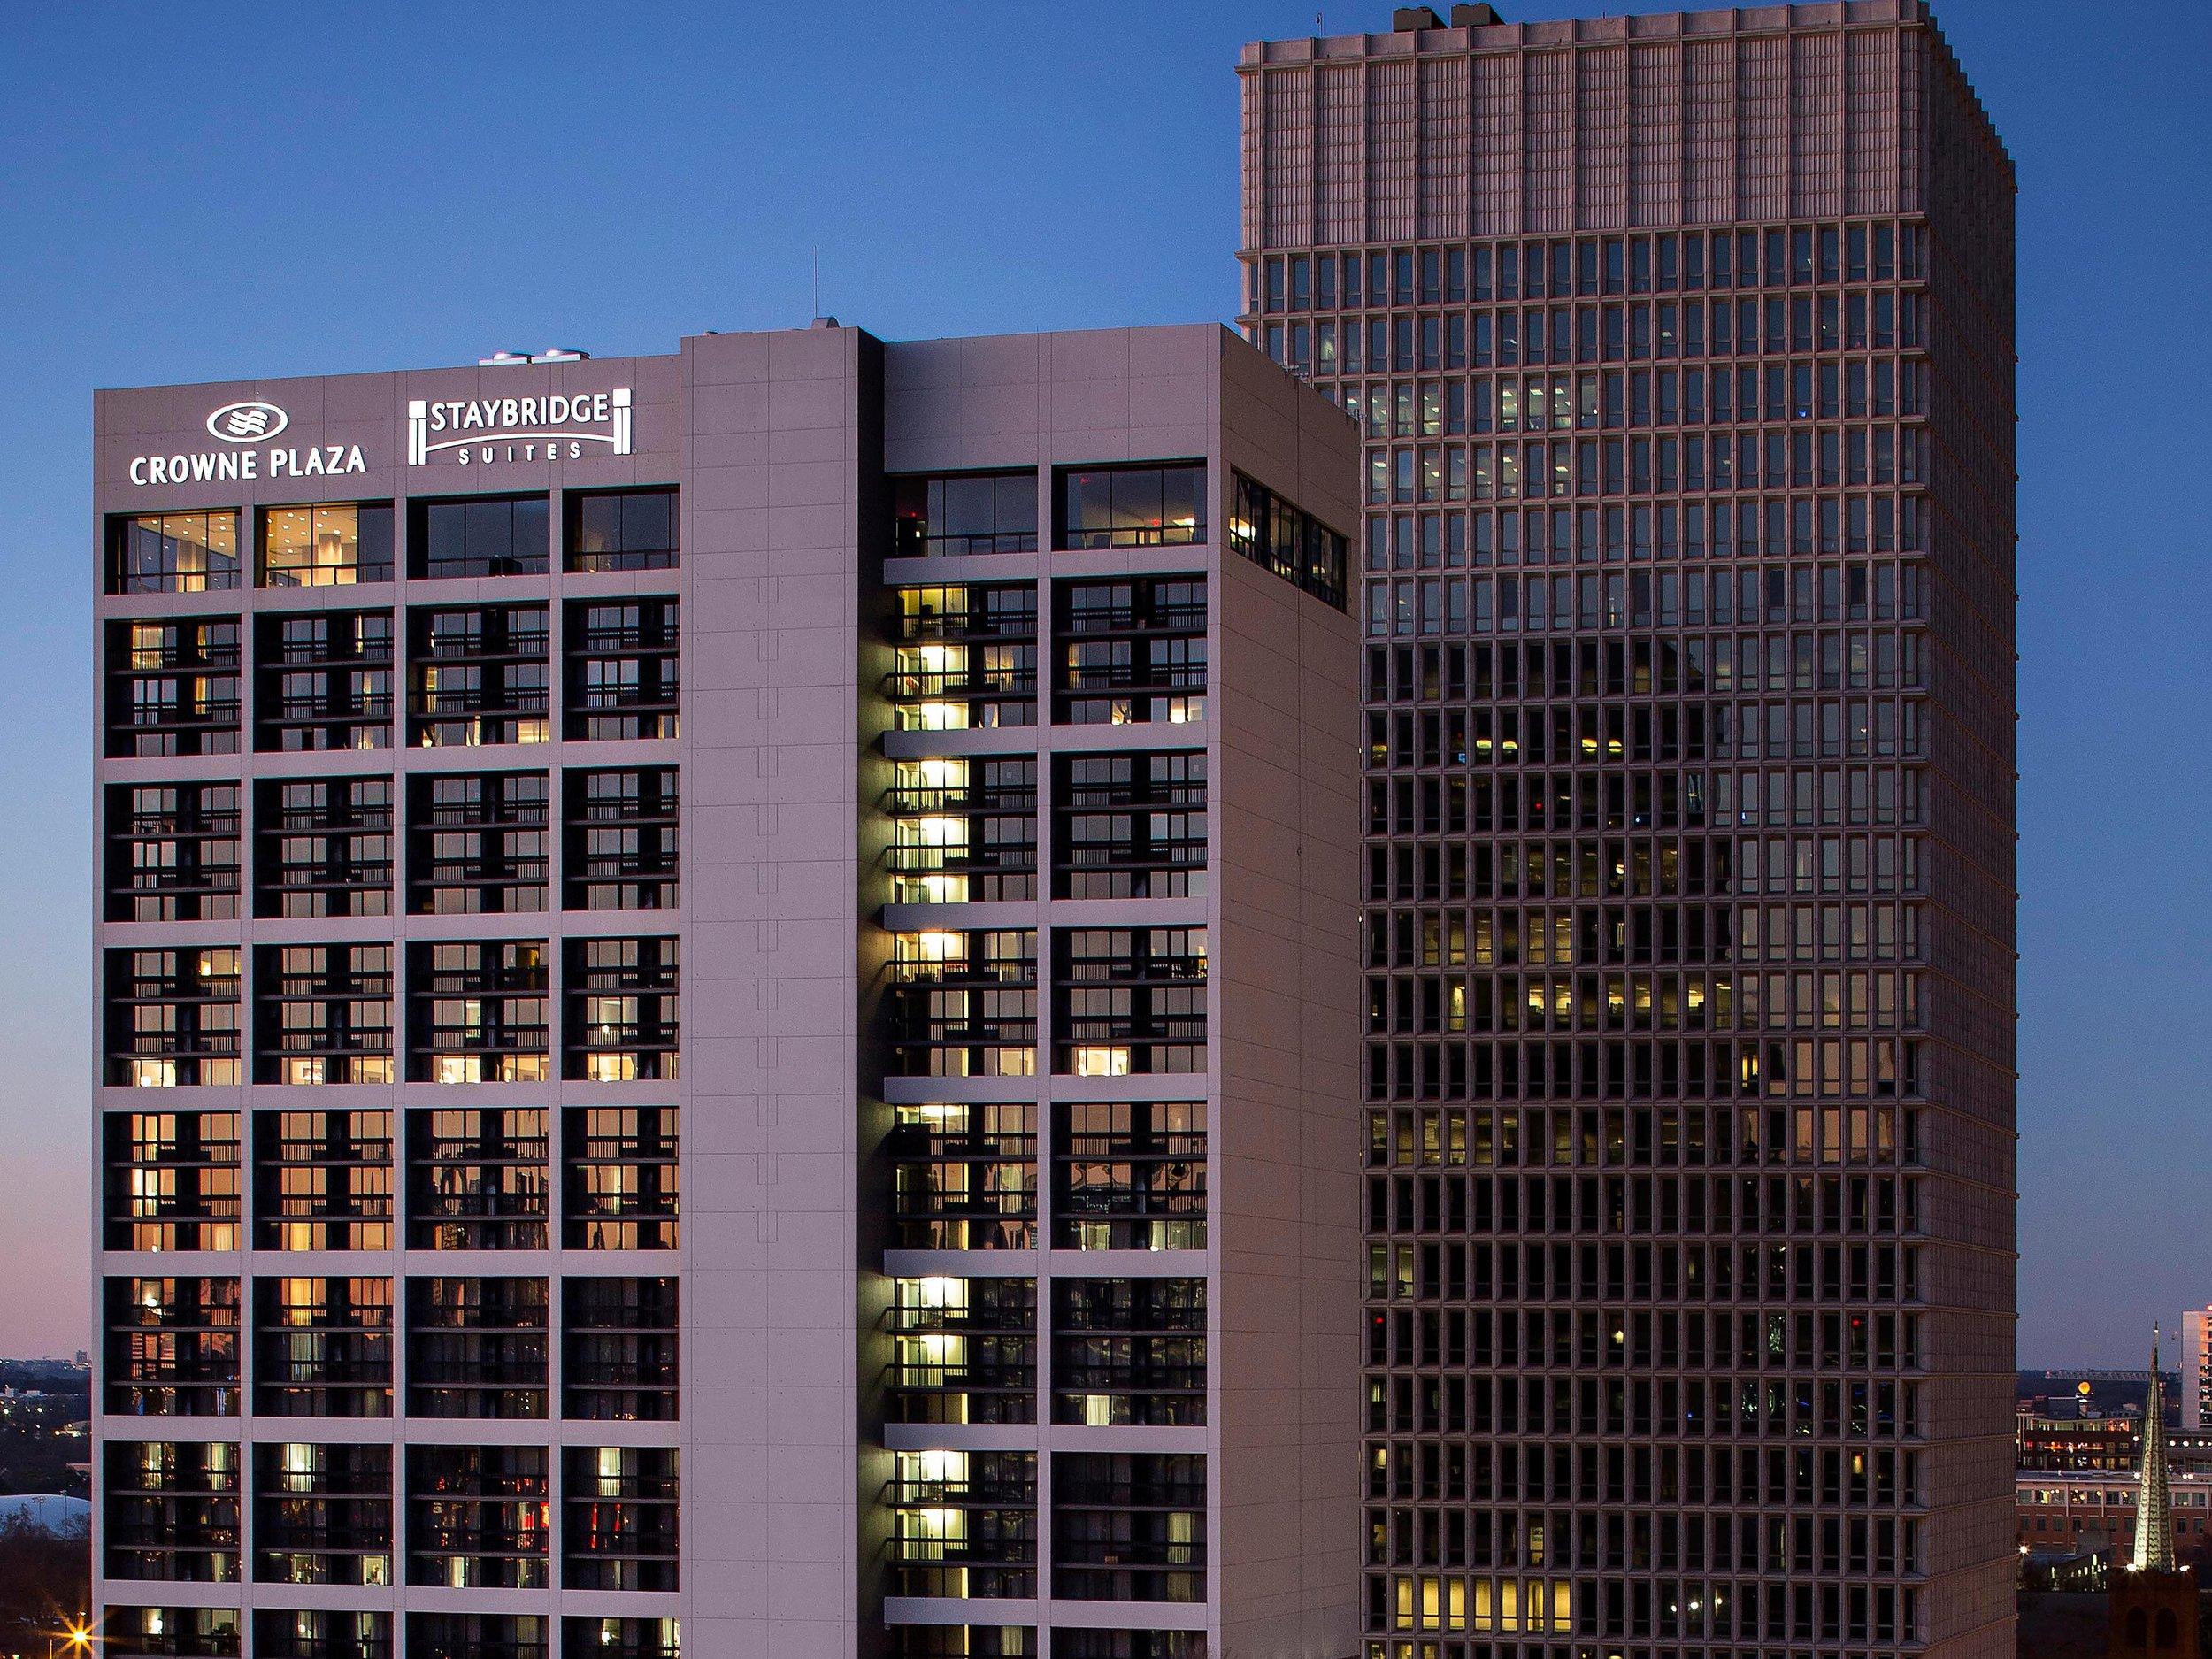 Crowne Plaza / Staybridge Suites Atlanta